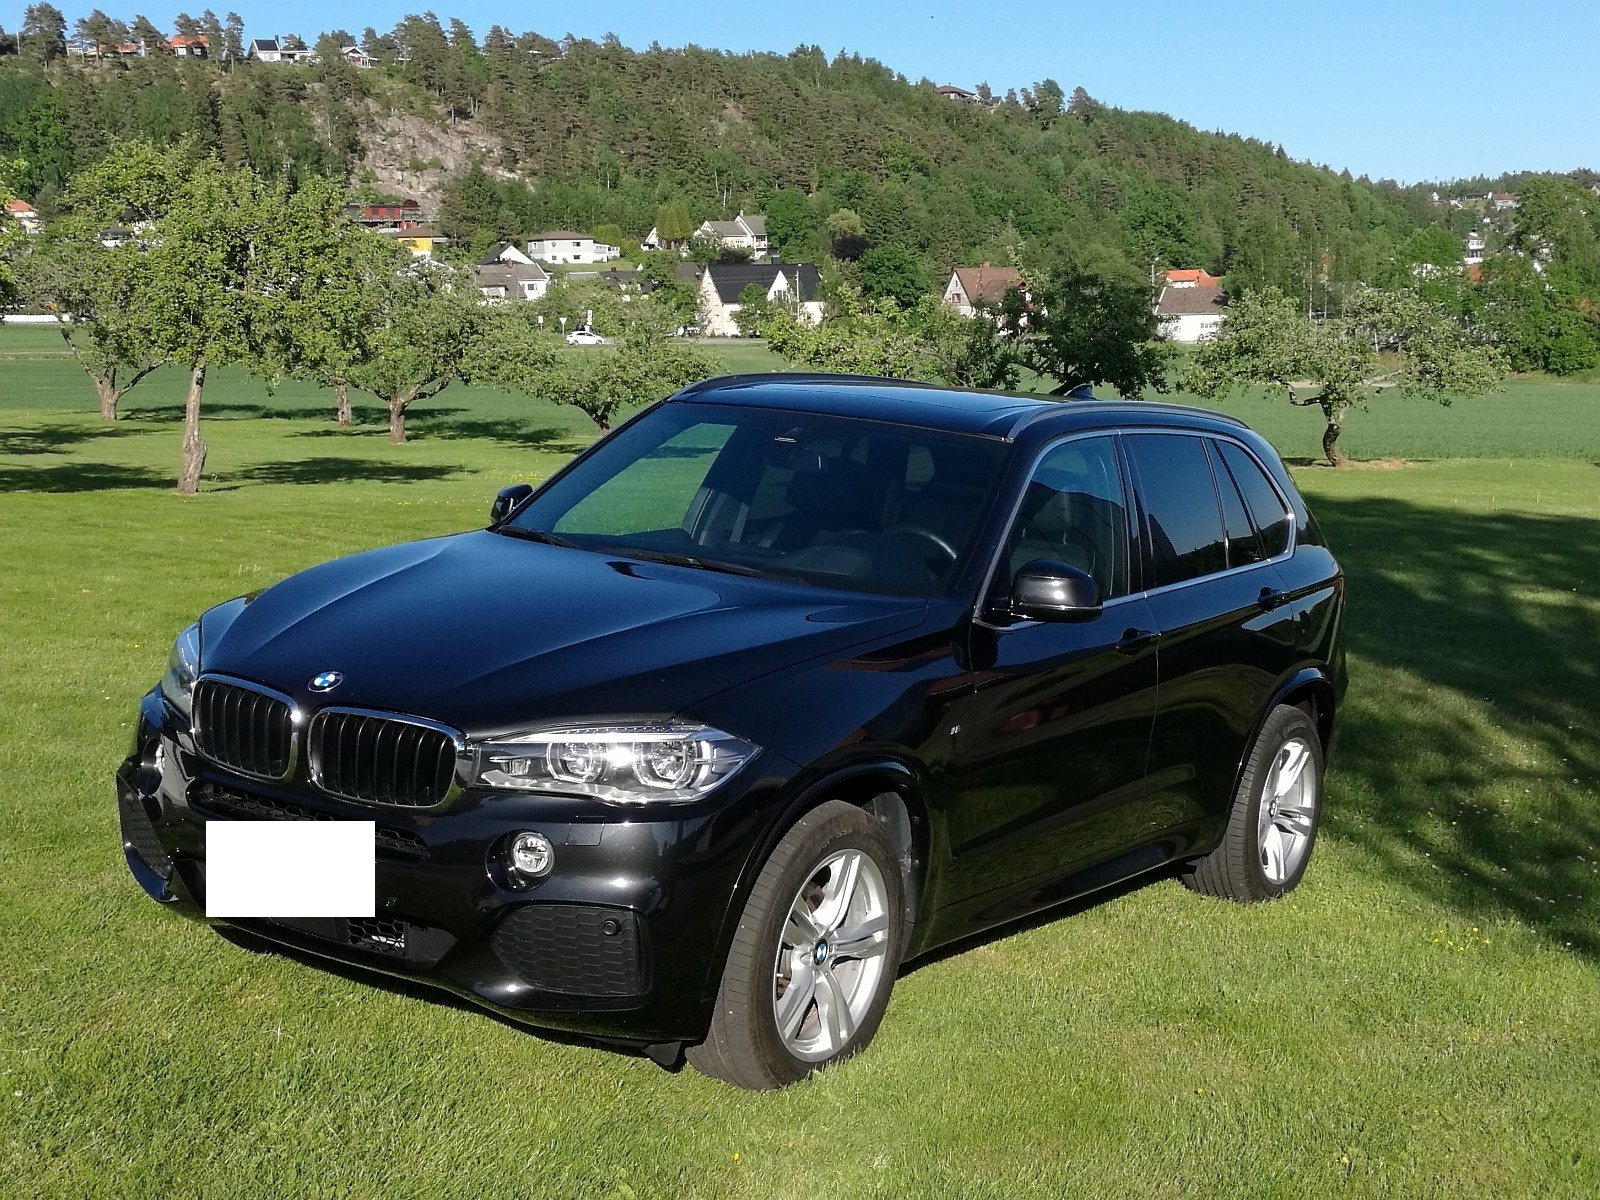 BMW X5 X Drive 25 d Webasto Panomara, 2015